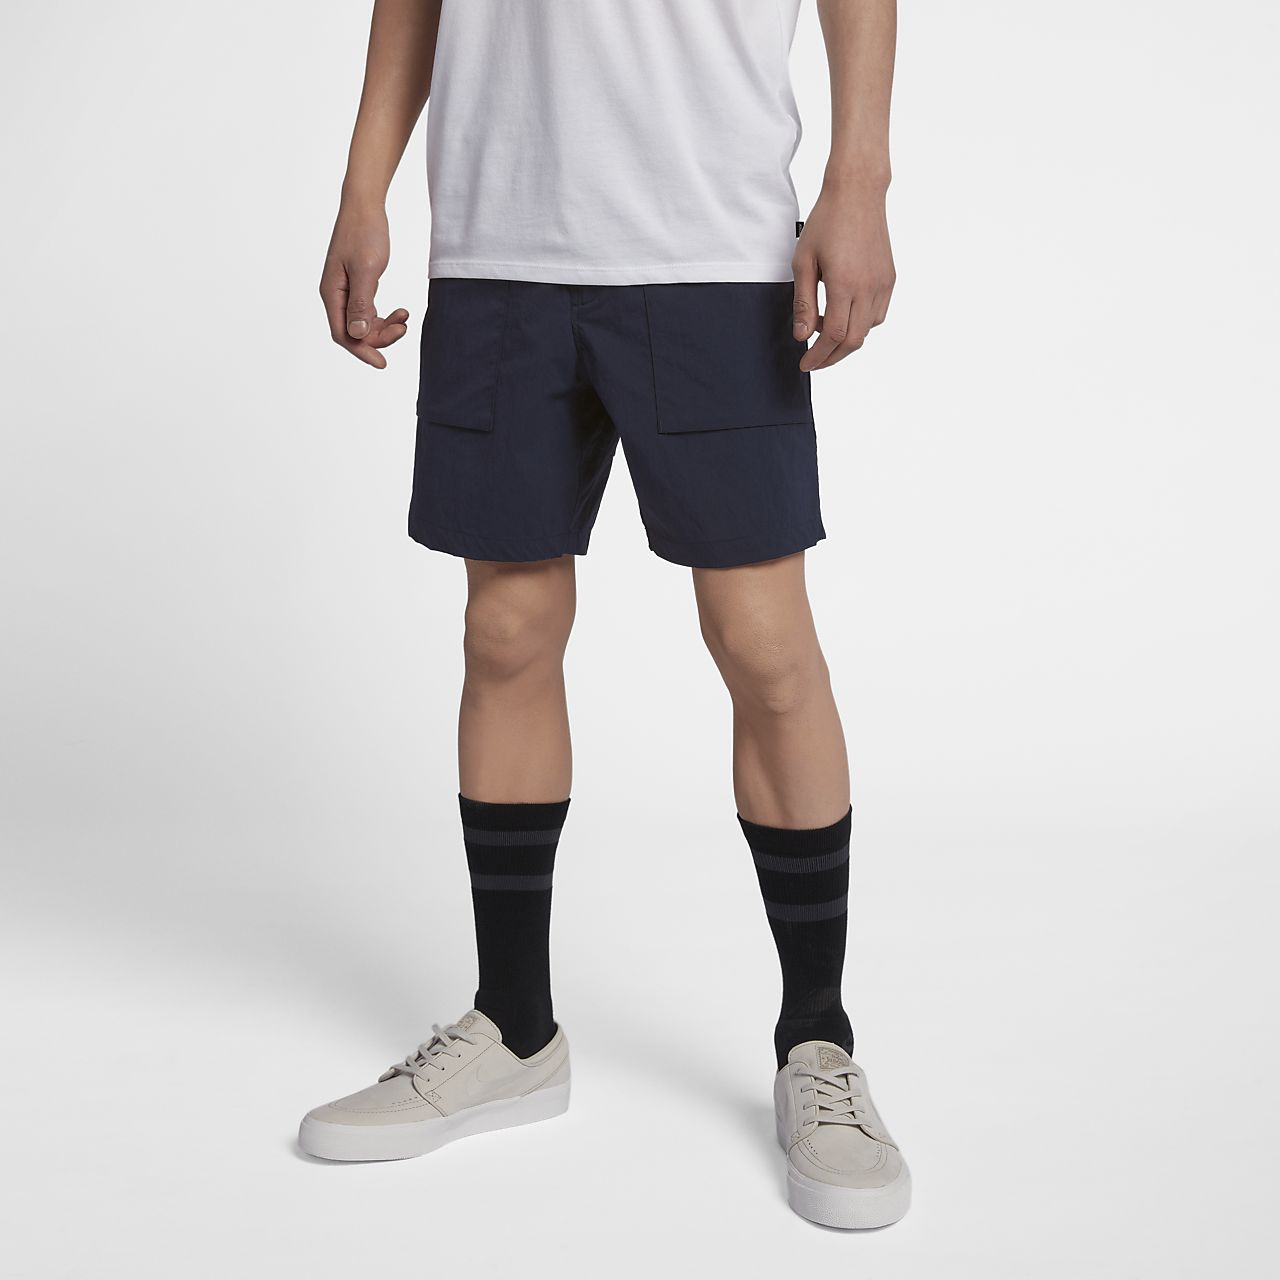 Nike Flex Men's Everett Sb Shorts Gb HrqFHxO5